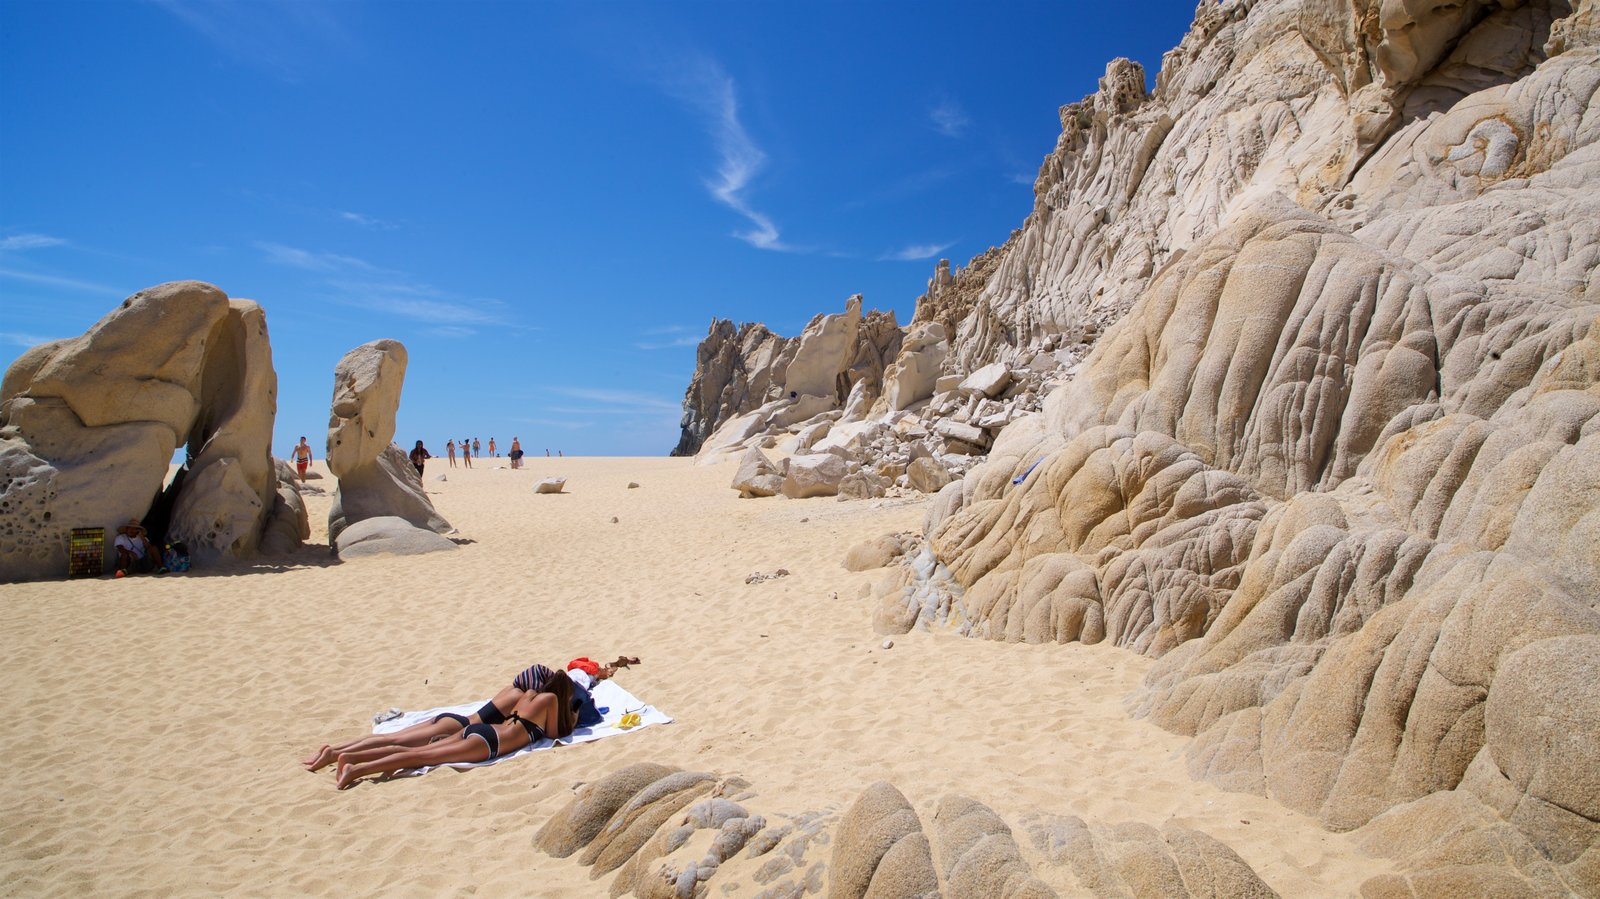 Playa del Amor showing general coastal views, rugged coastline and a beach